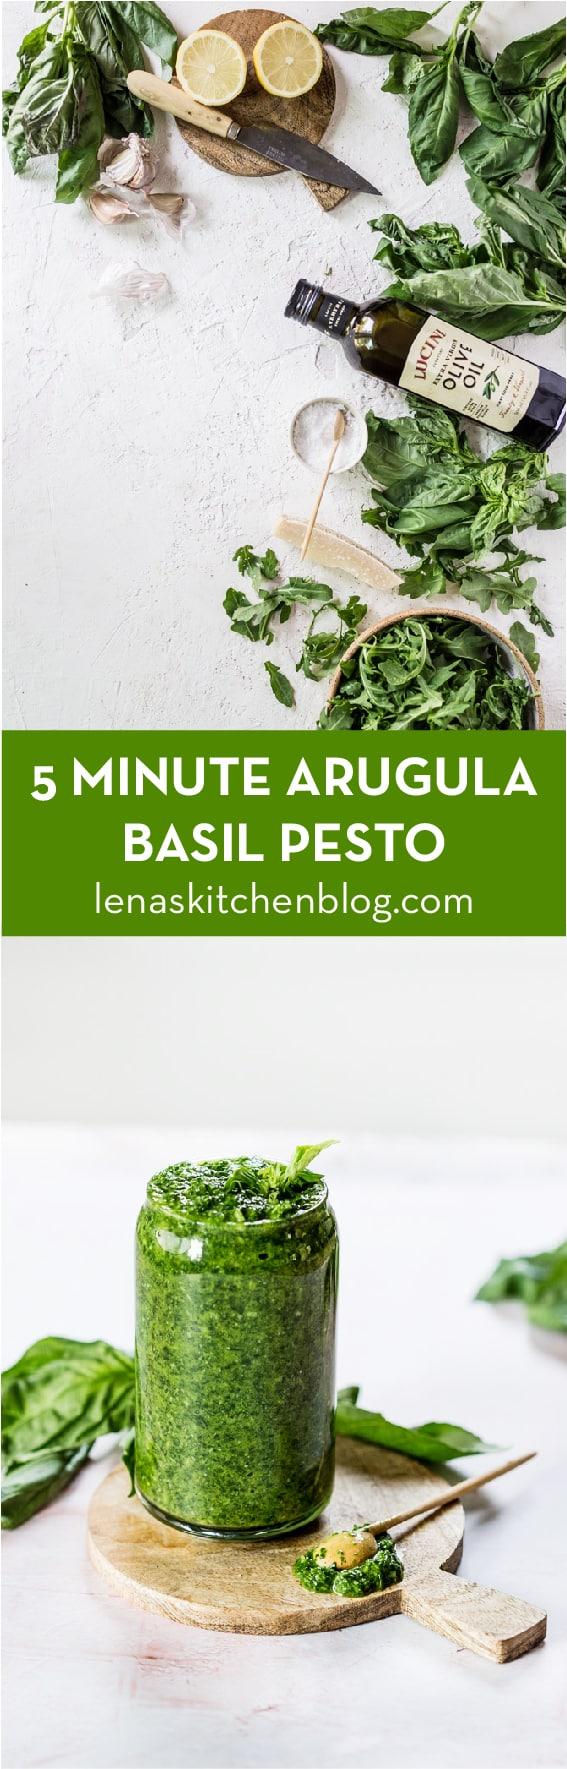 5 MINUTE ARUGULA BASIL PESTO made with cheese, garlic, olive oil and salt by lenaskitchenblog.com